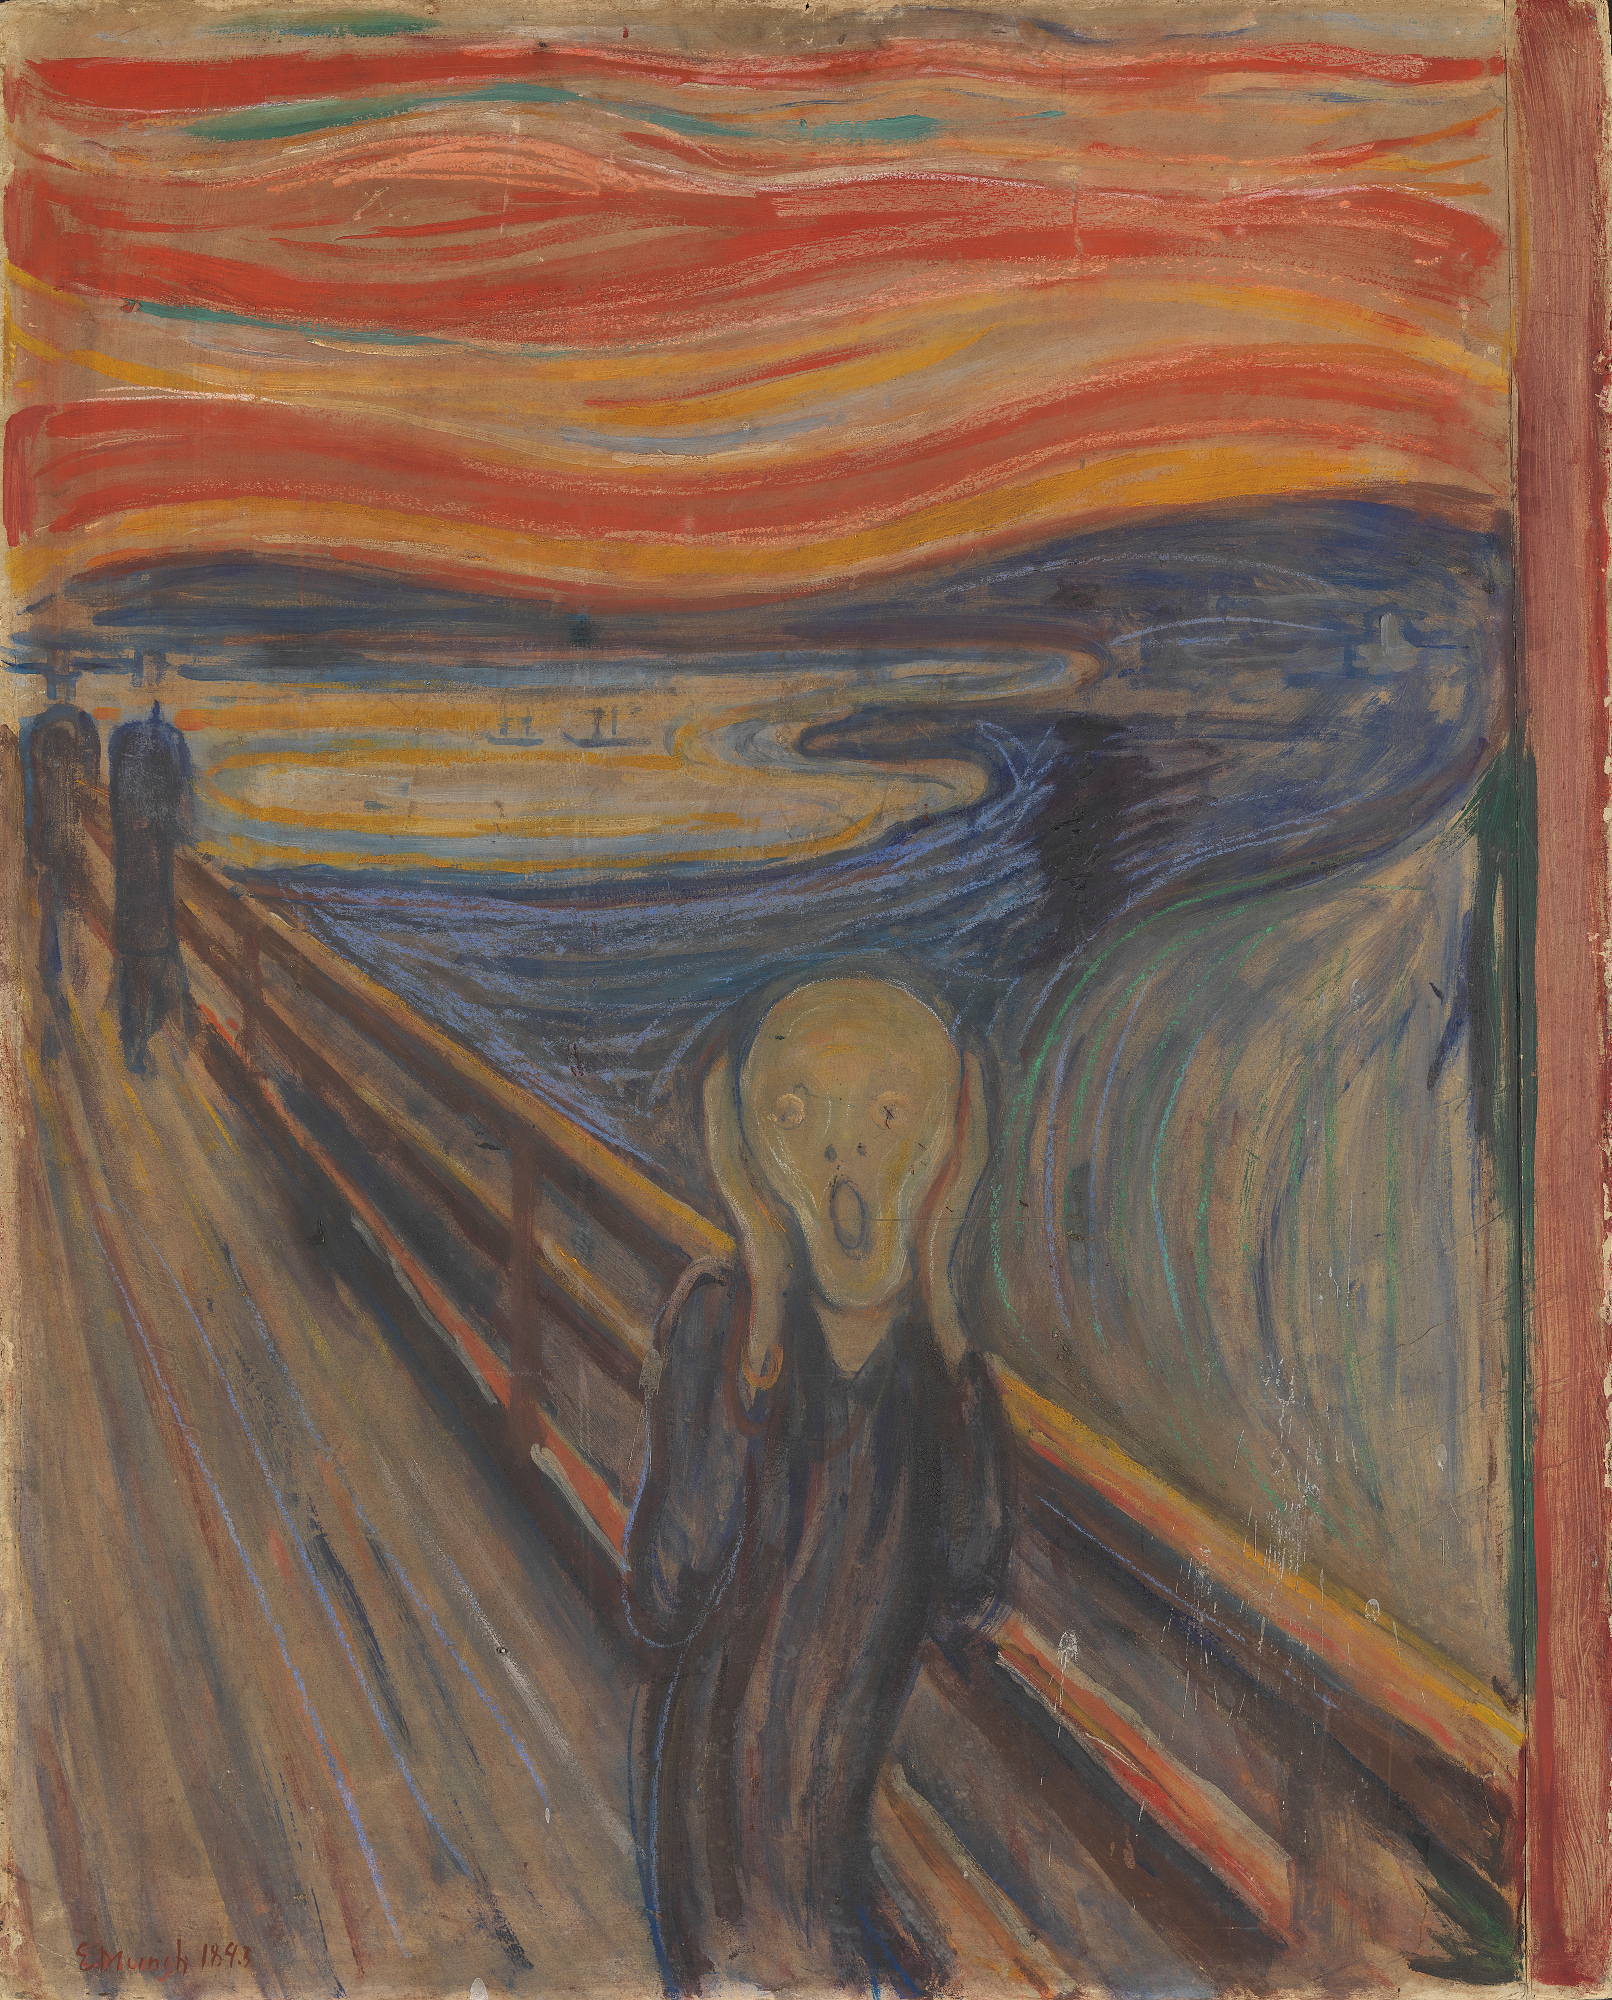 Edvard Munch The Scream, 1893